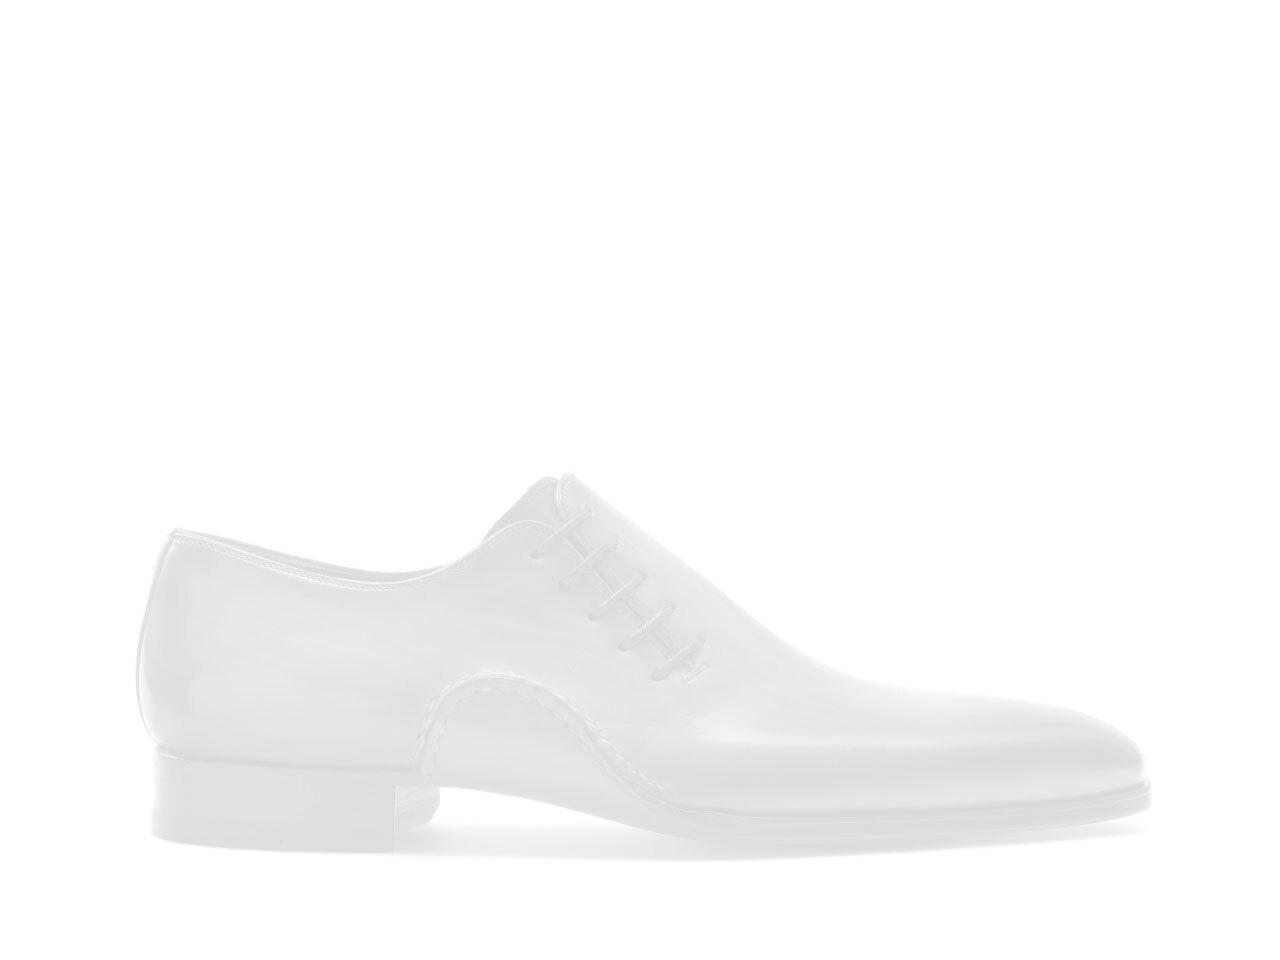 Pair of the Magnanni Blanco Lo | White